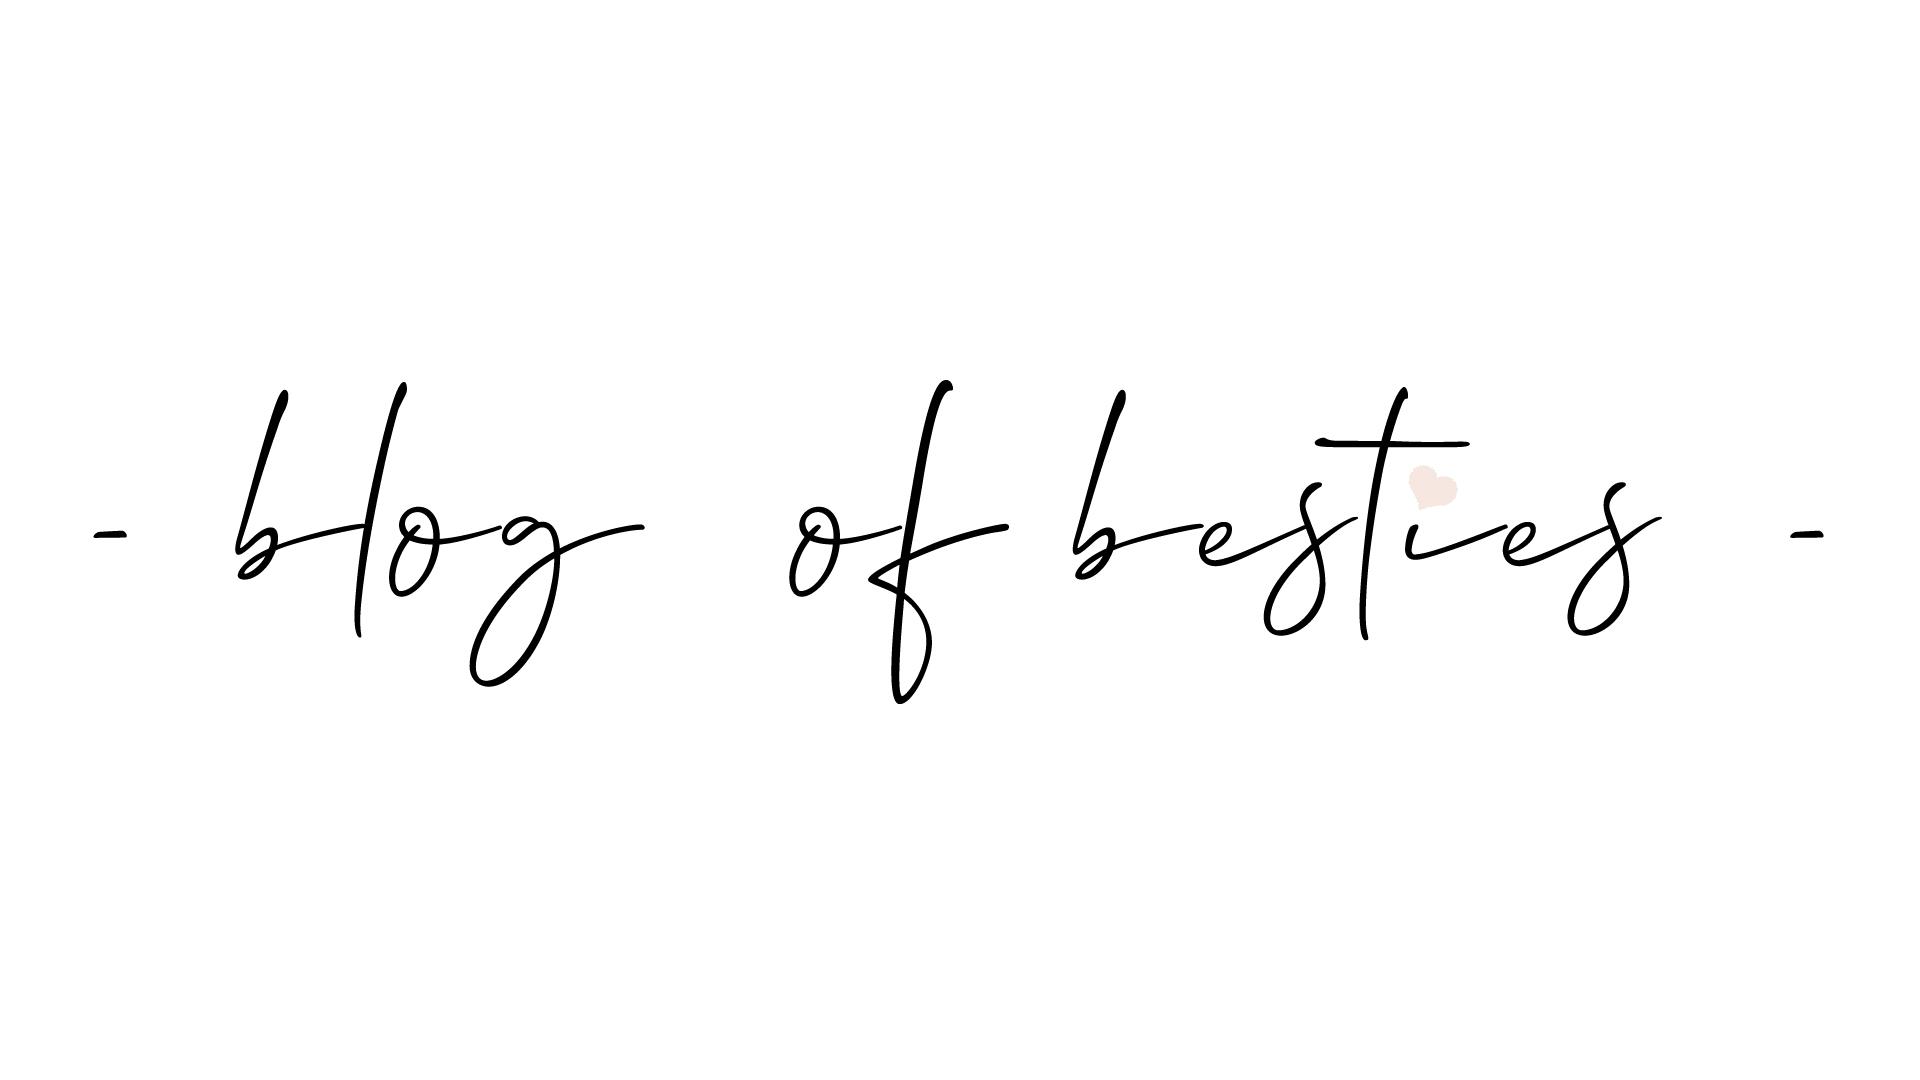 Blog of Besties